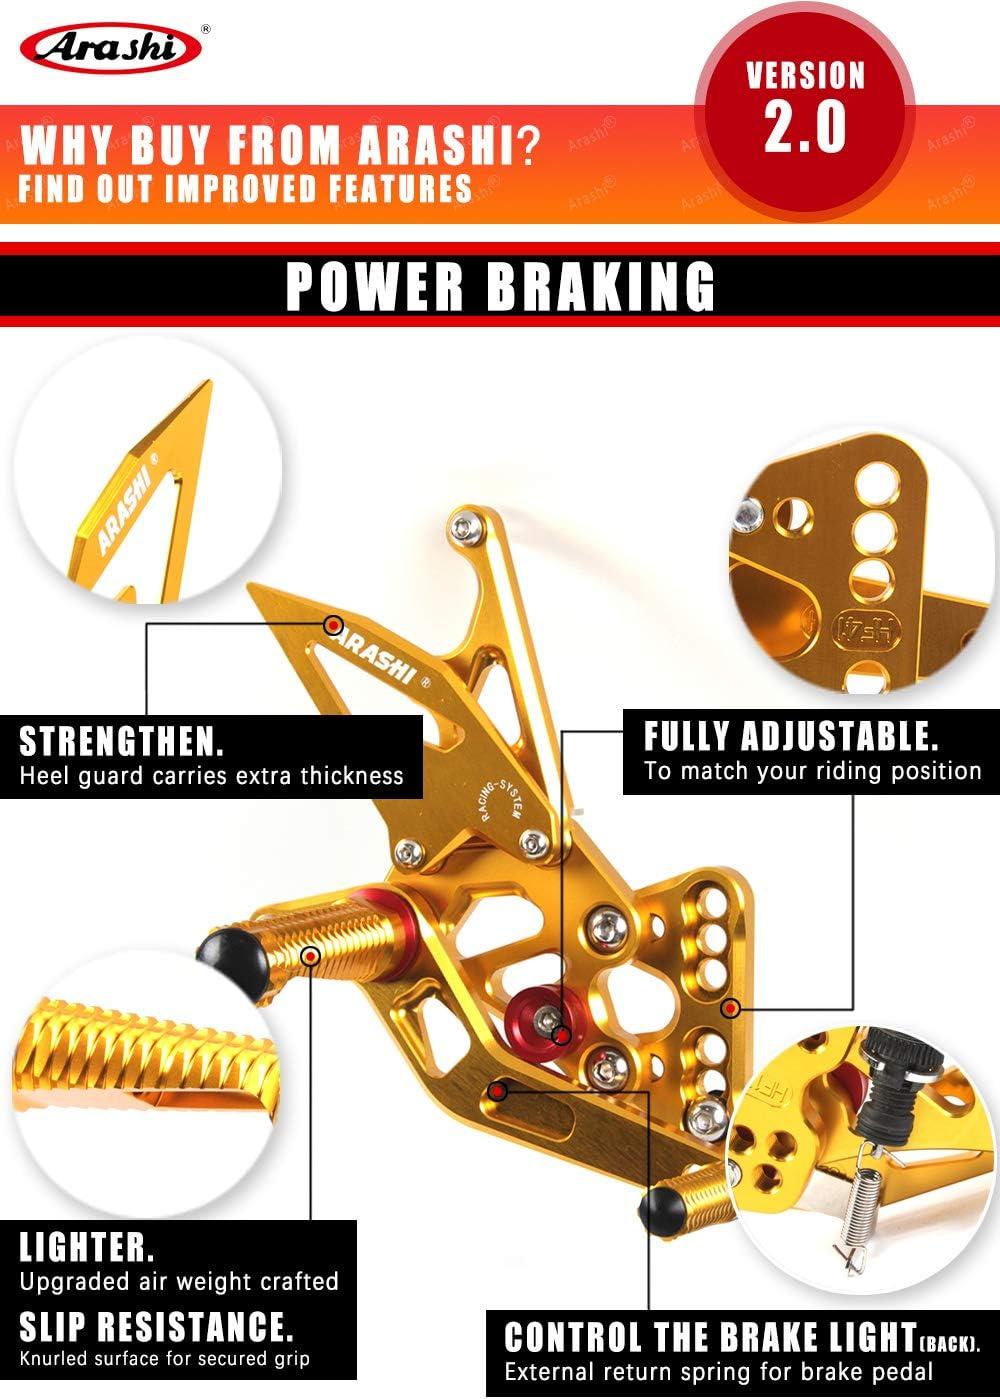 Adjustable Rearsets for HONDA CBR600RR 2009-2016 ABS Motorcycle Accessories Foot Pegs Footrests Rear Set CBR 600 CBR600 RR 600RR Black 2010 2011 2012 2013 2014 2015 Arashi Version 2.0